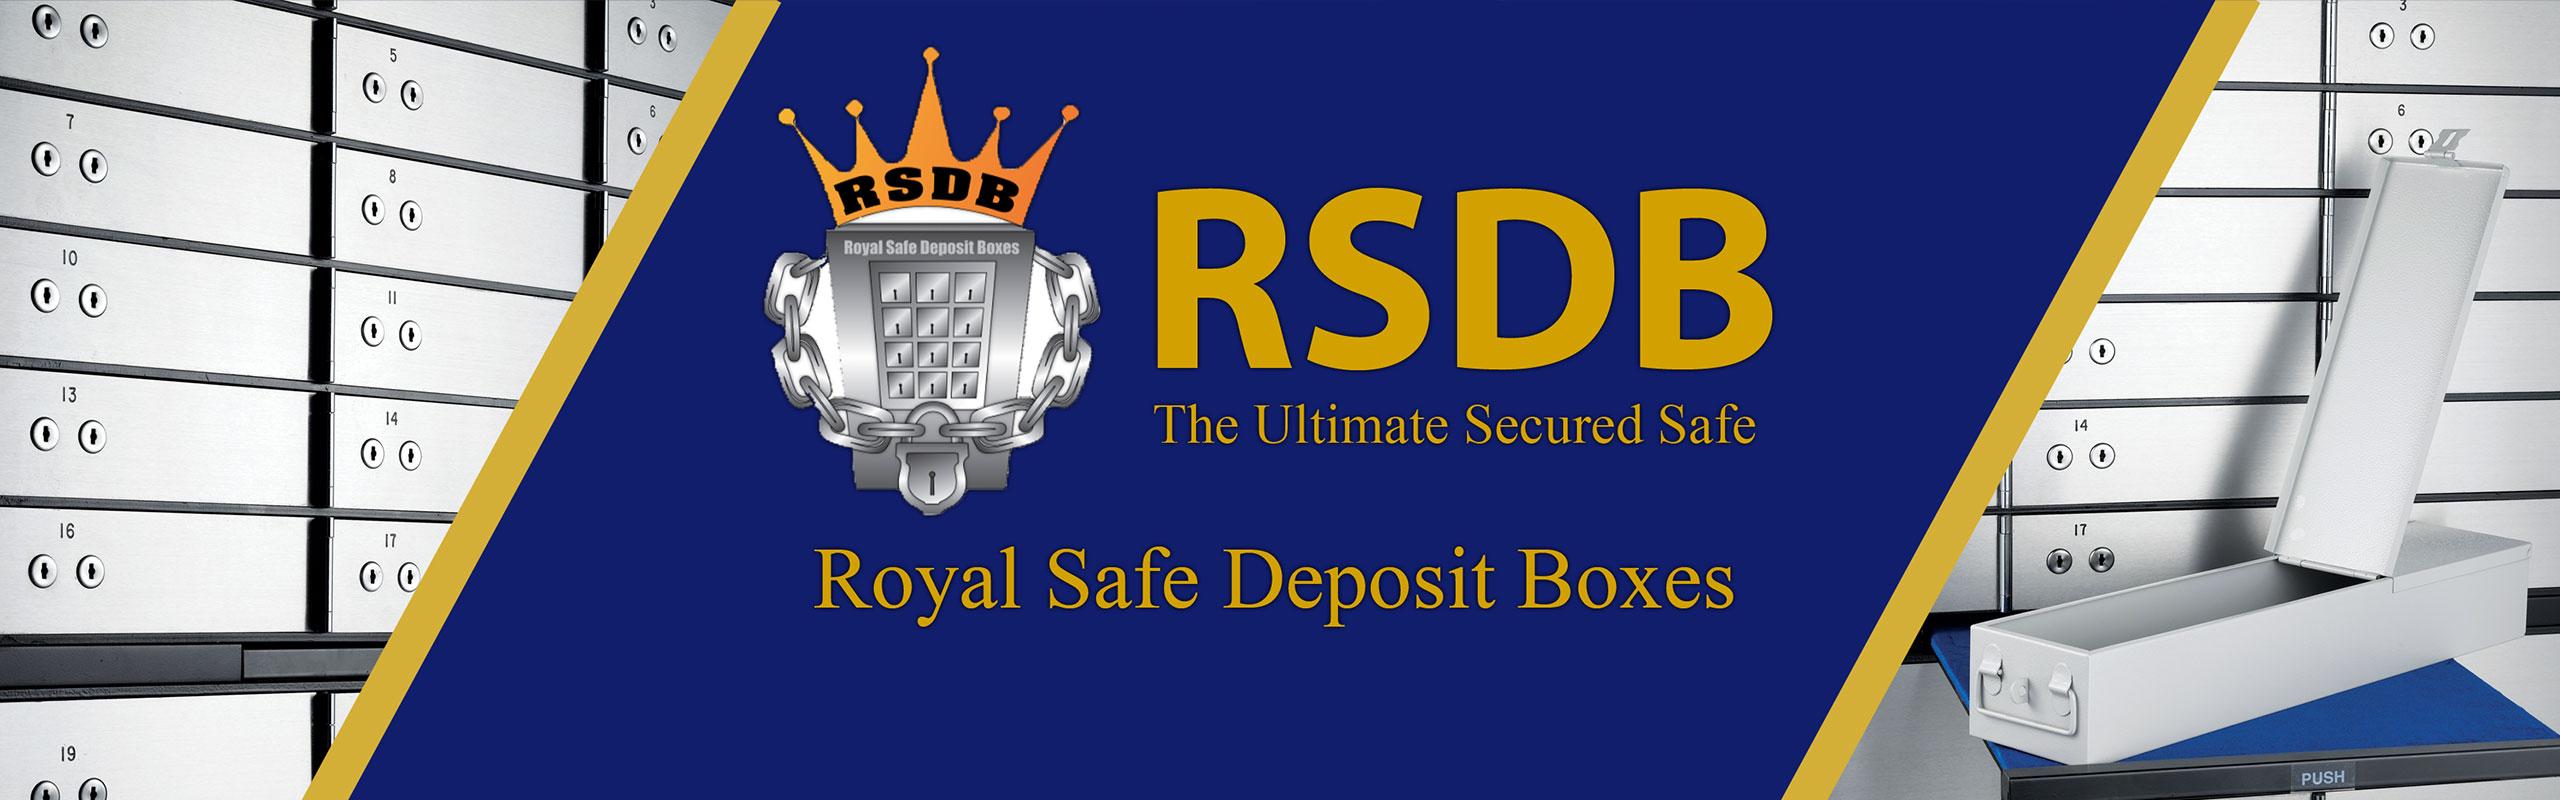 RSDB-Banner-Carousel-2-min